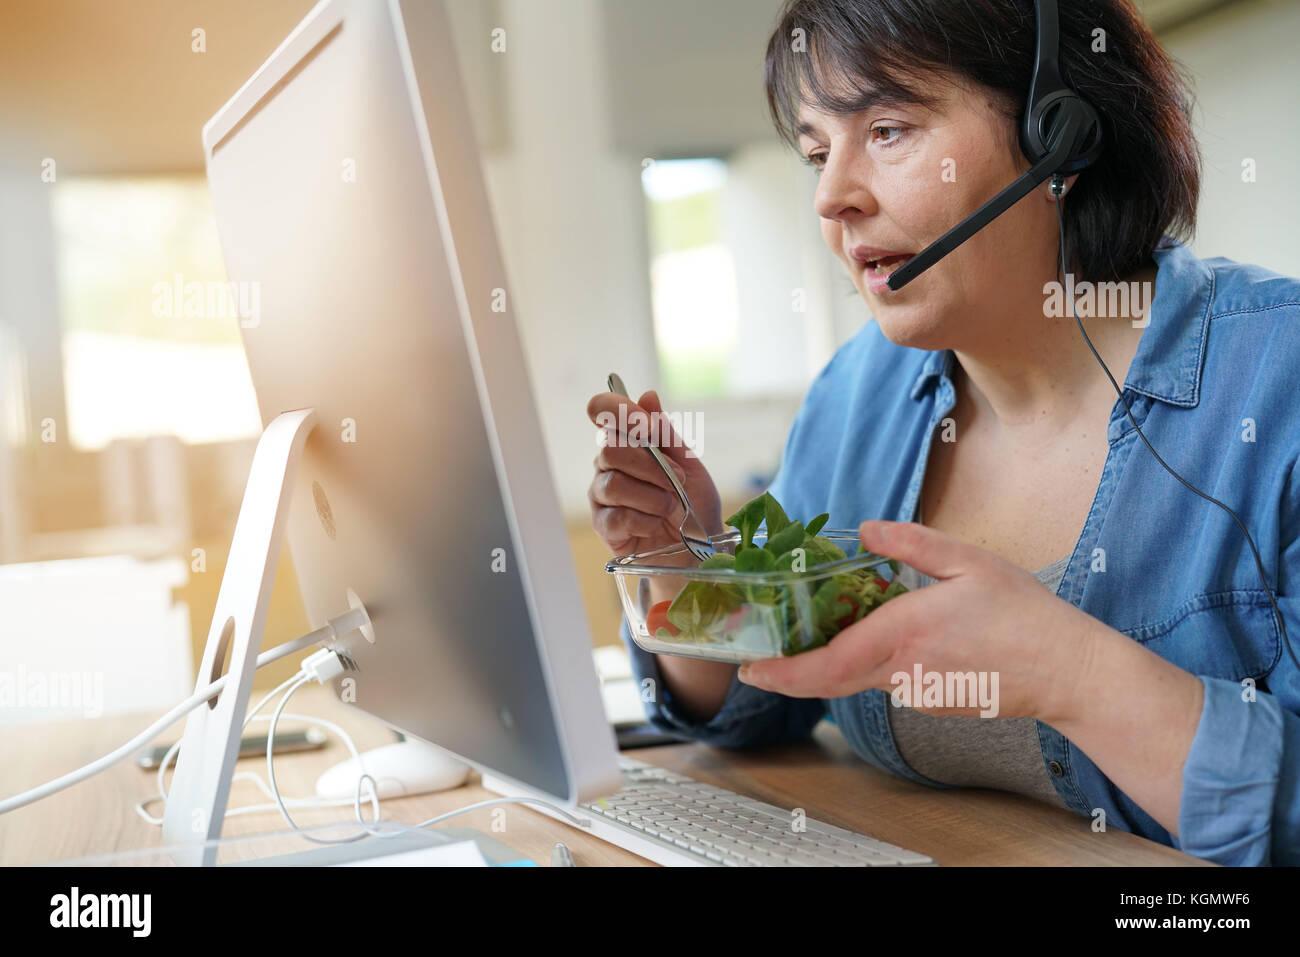 Telemarketing operator having lunch at work - Stock Image